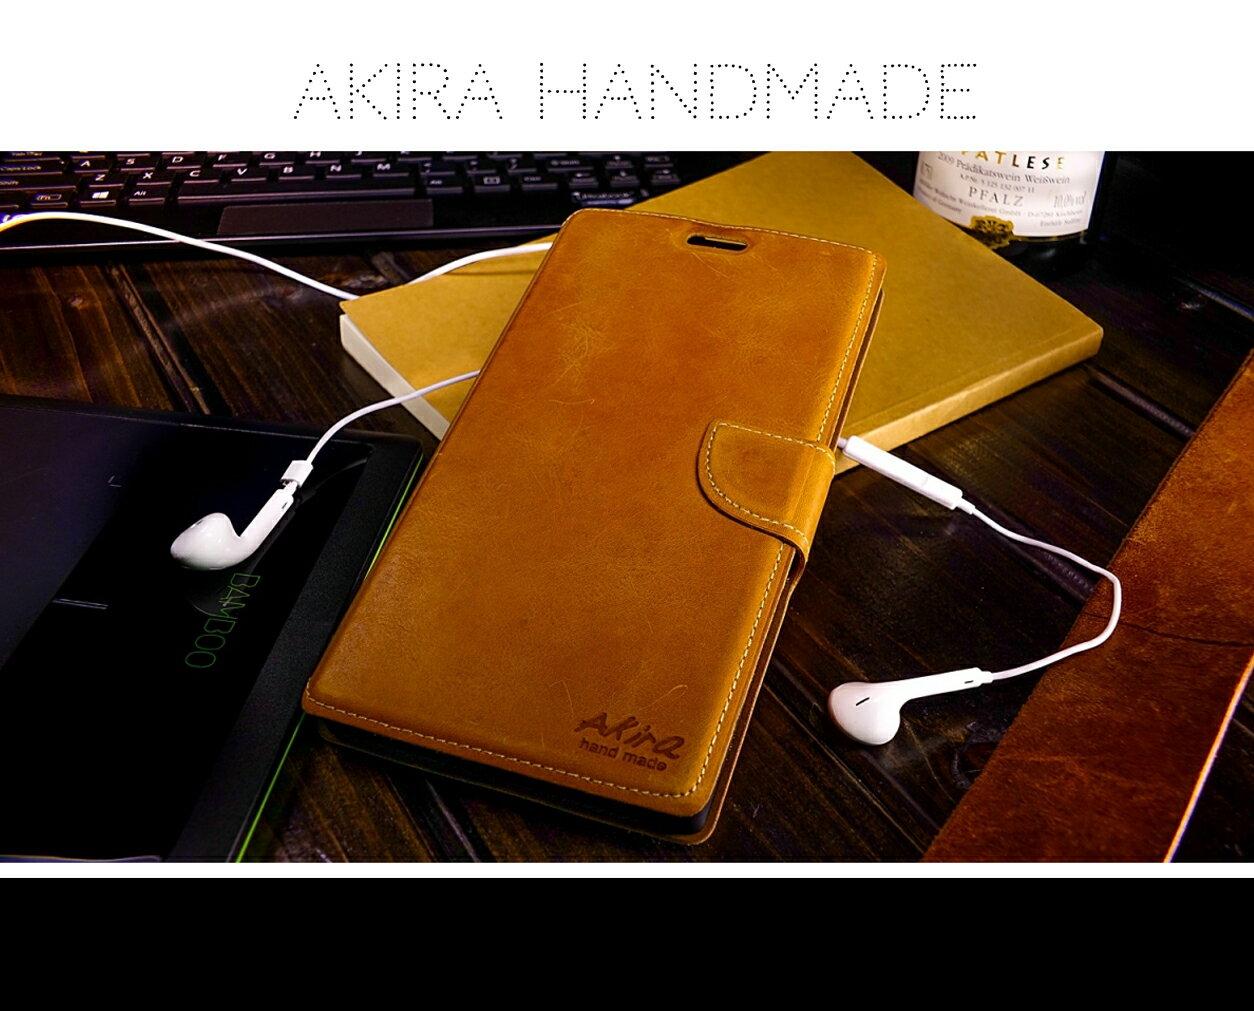 [SONY] Akira手工真皮皮套 [基本款棕色][Z2,Z3,Z4,Z5,Z5+,Z5C,C4] 1